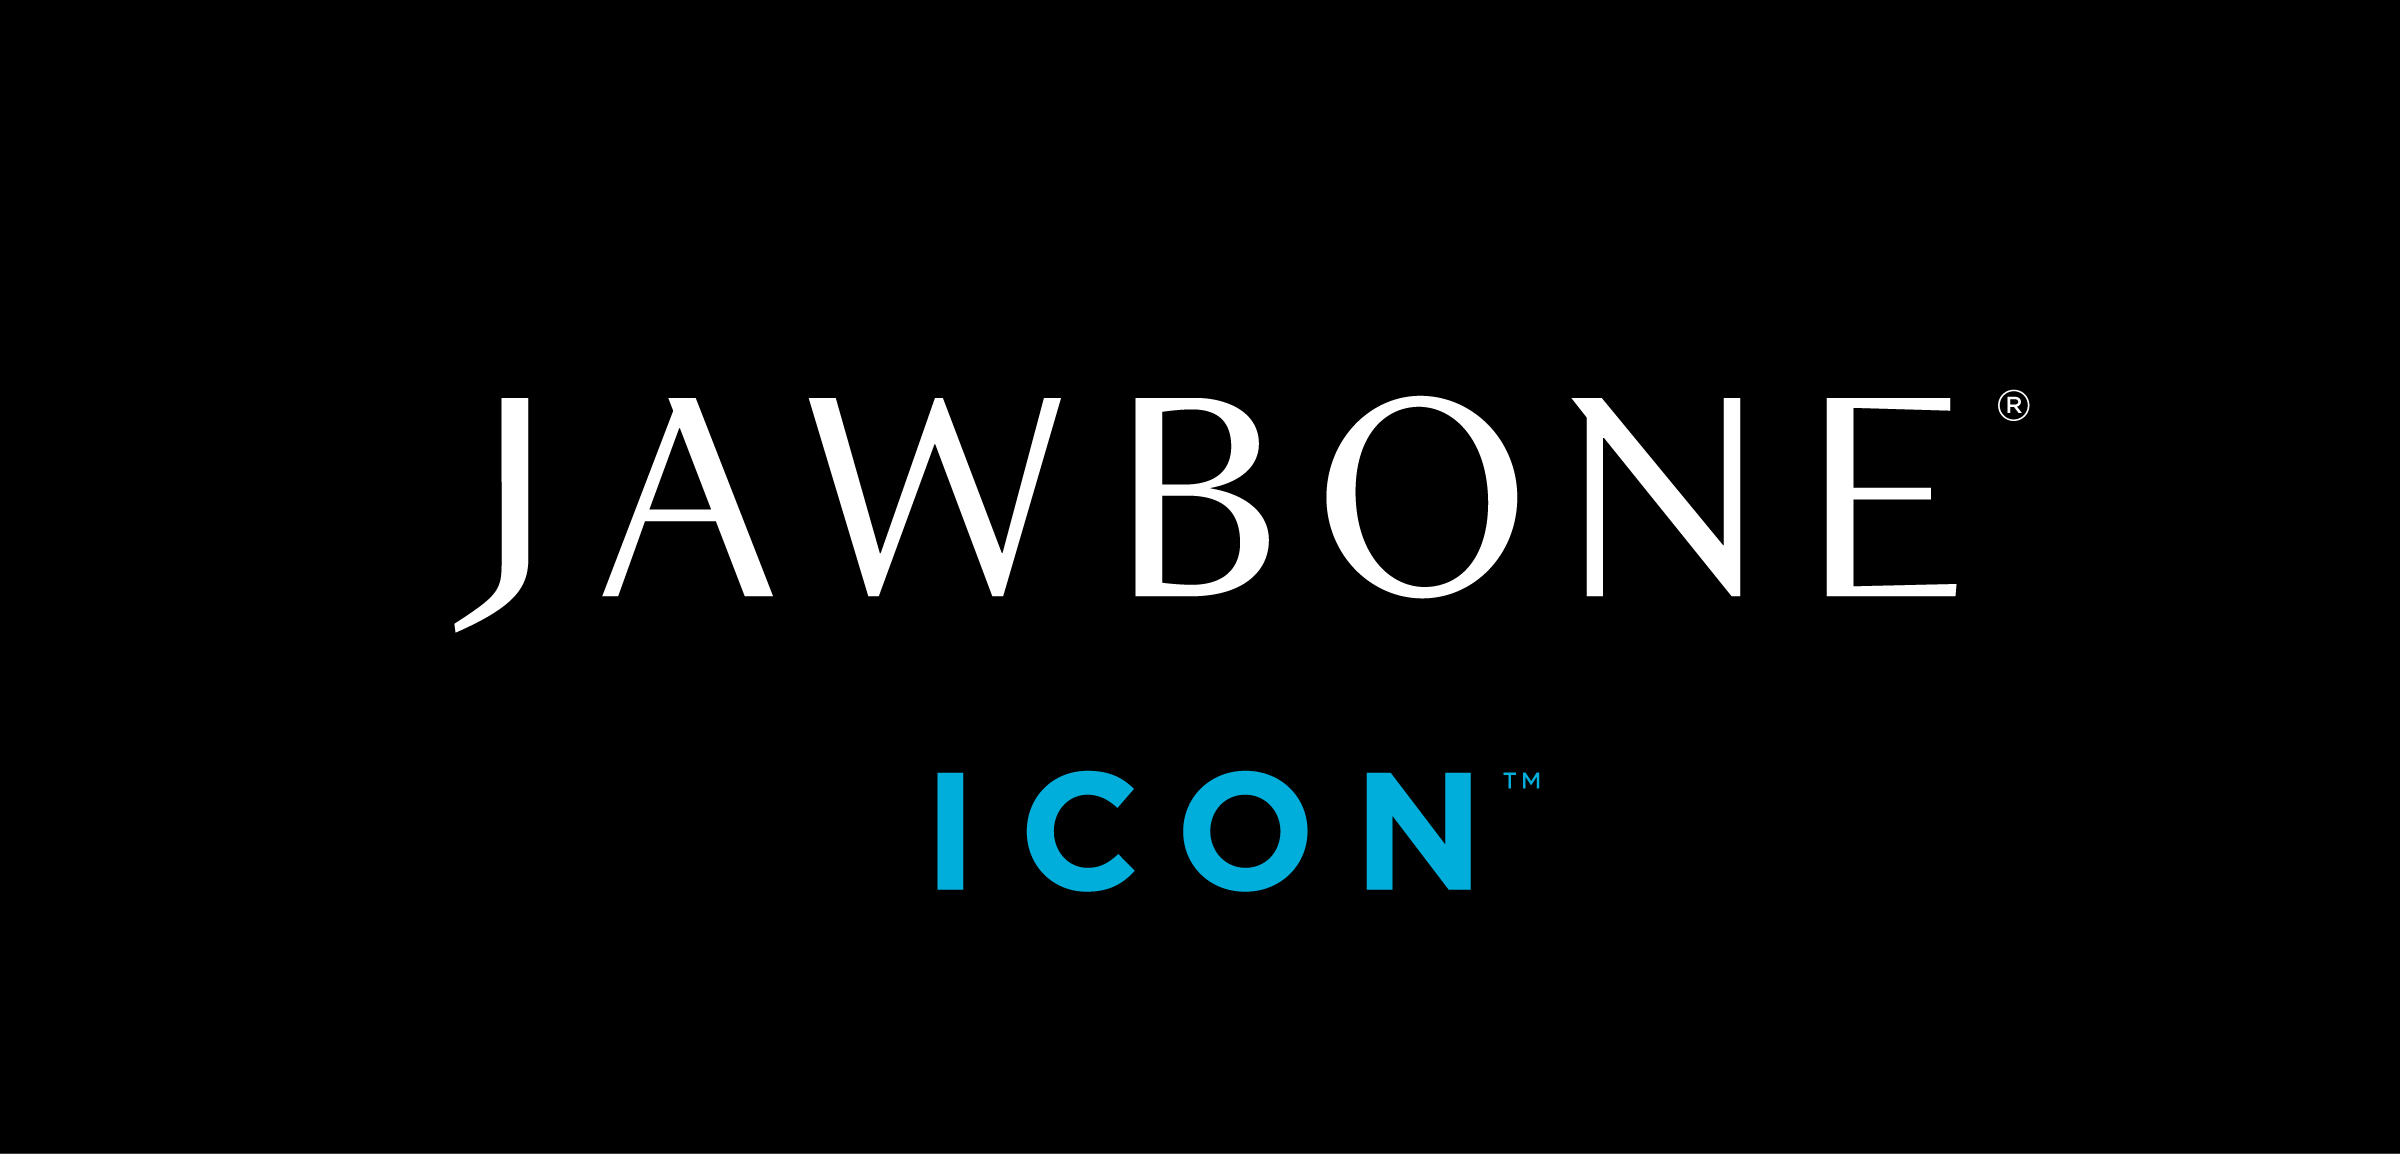 jawbone_icon